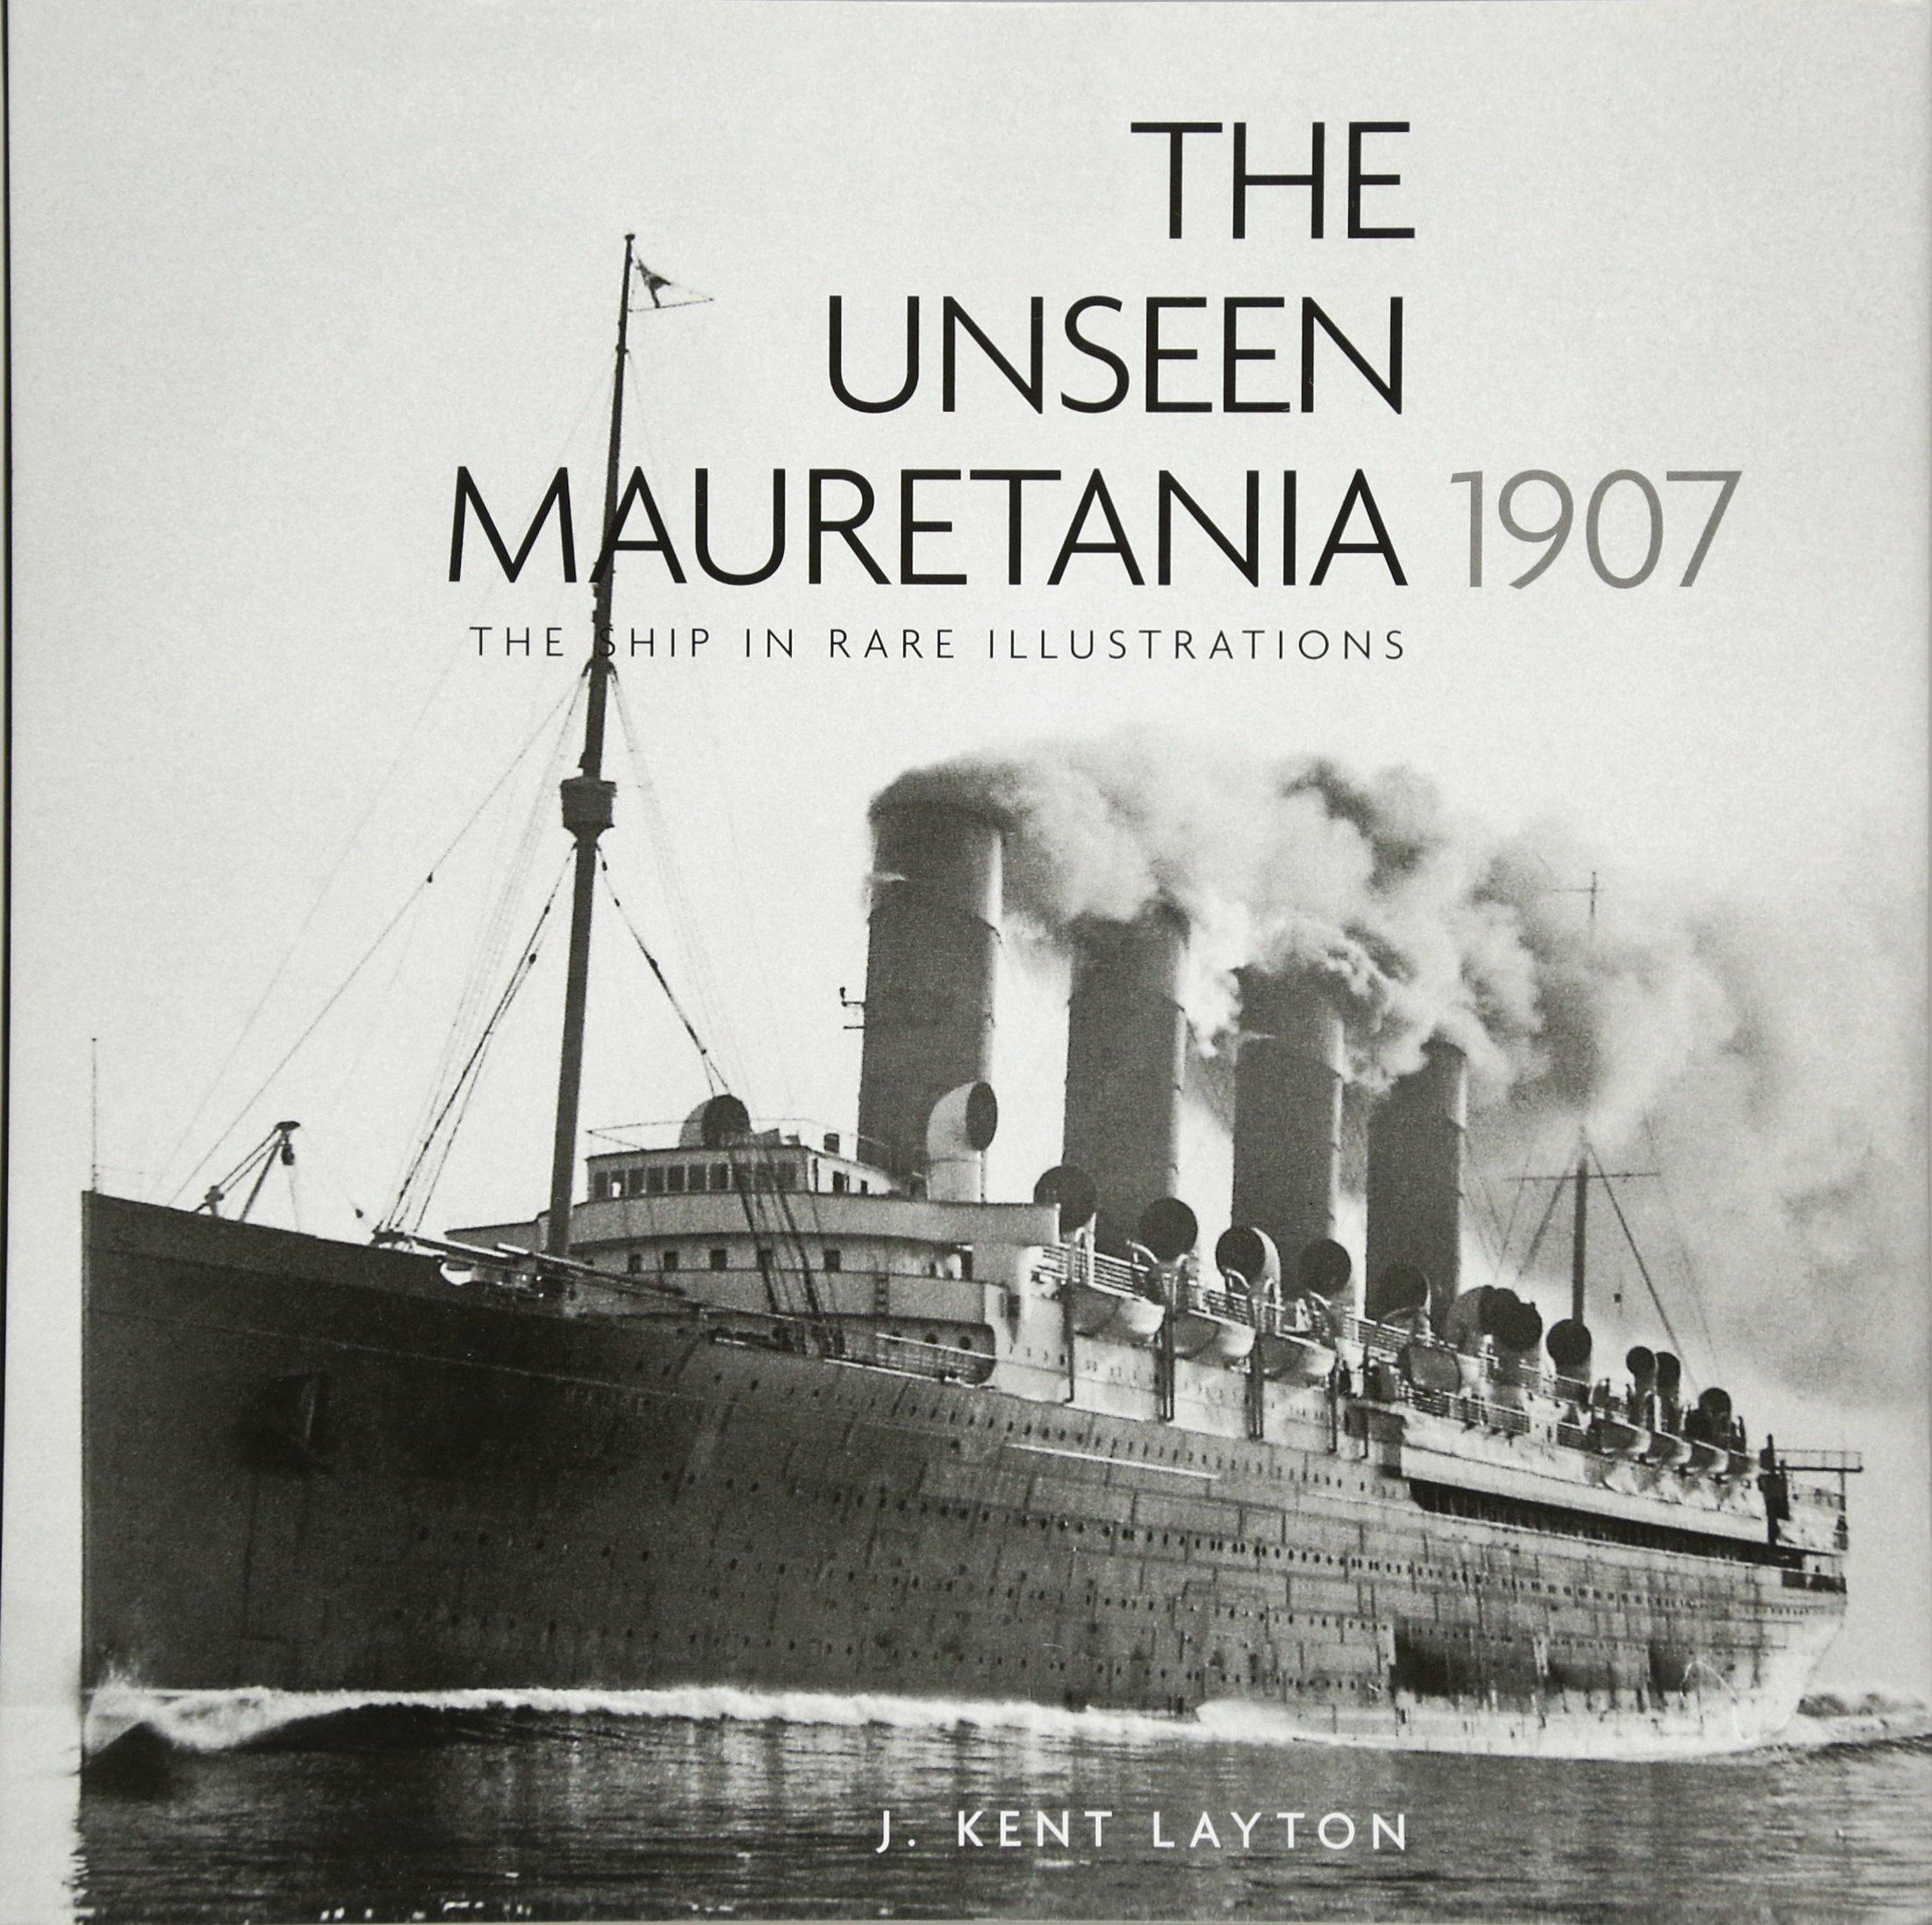 The Unseen Mauretania (1907): The Ship in Rare Illustrations